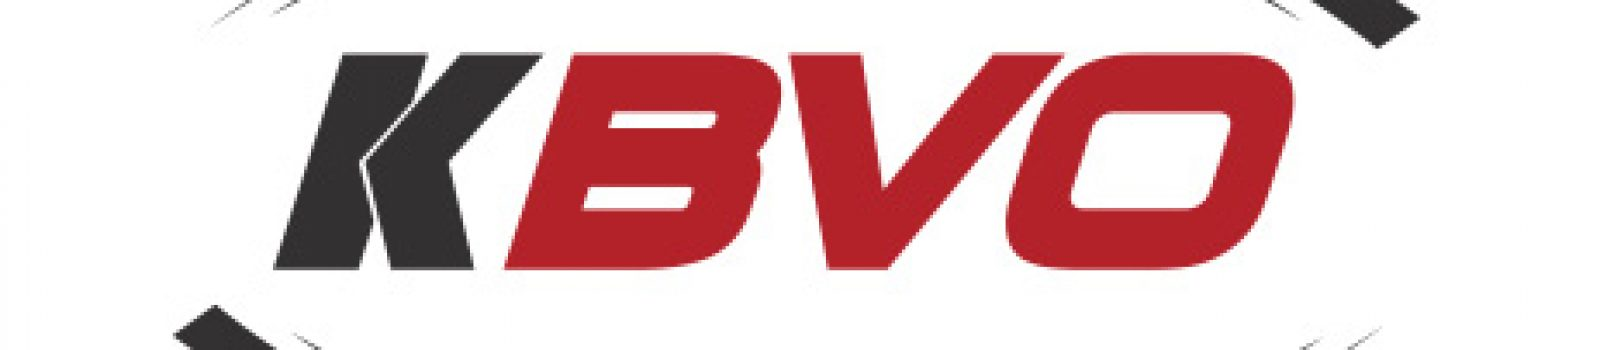 kbvo-09302016